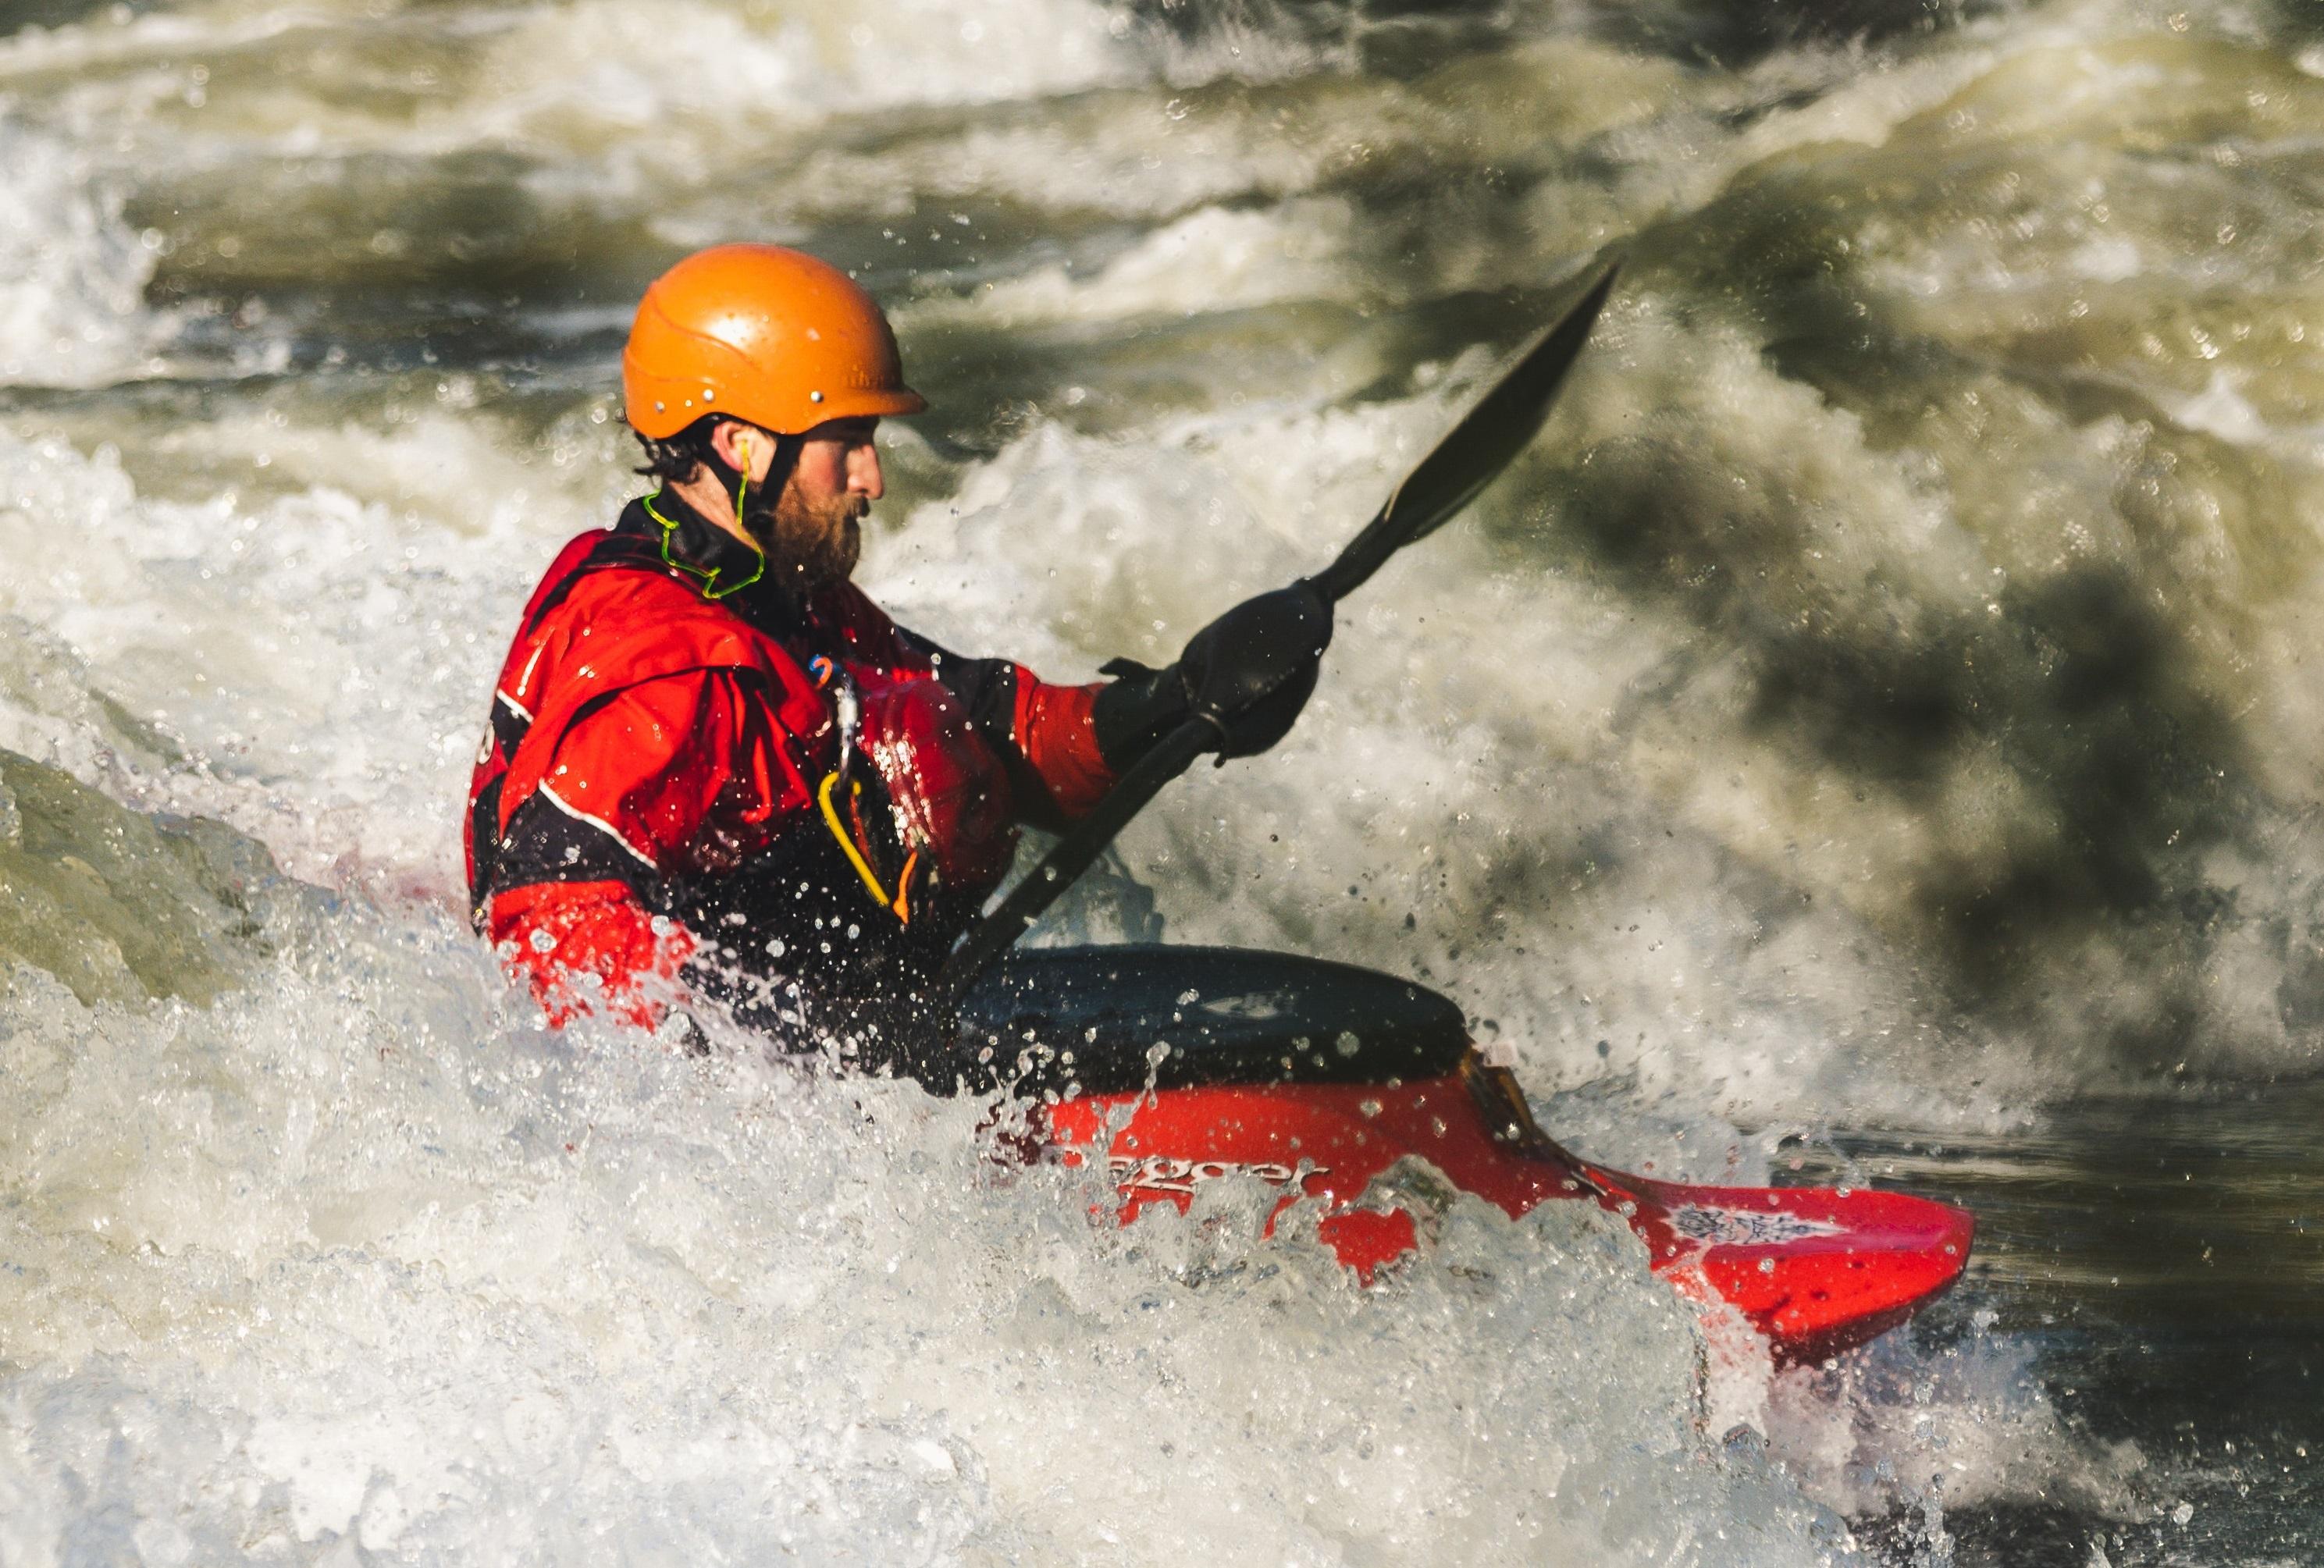 canoeist on white water rapids